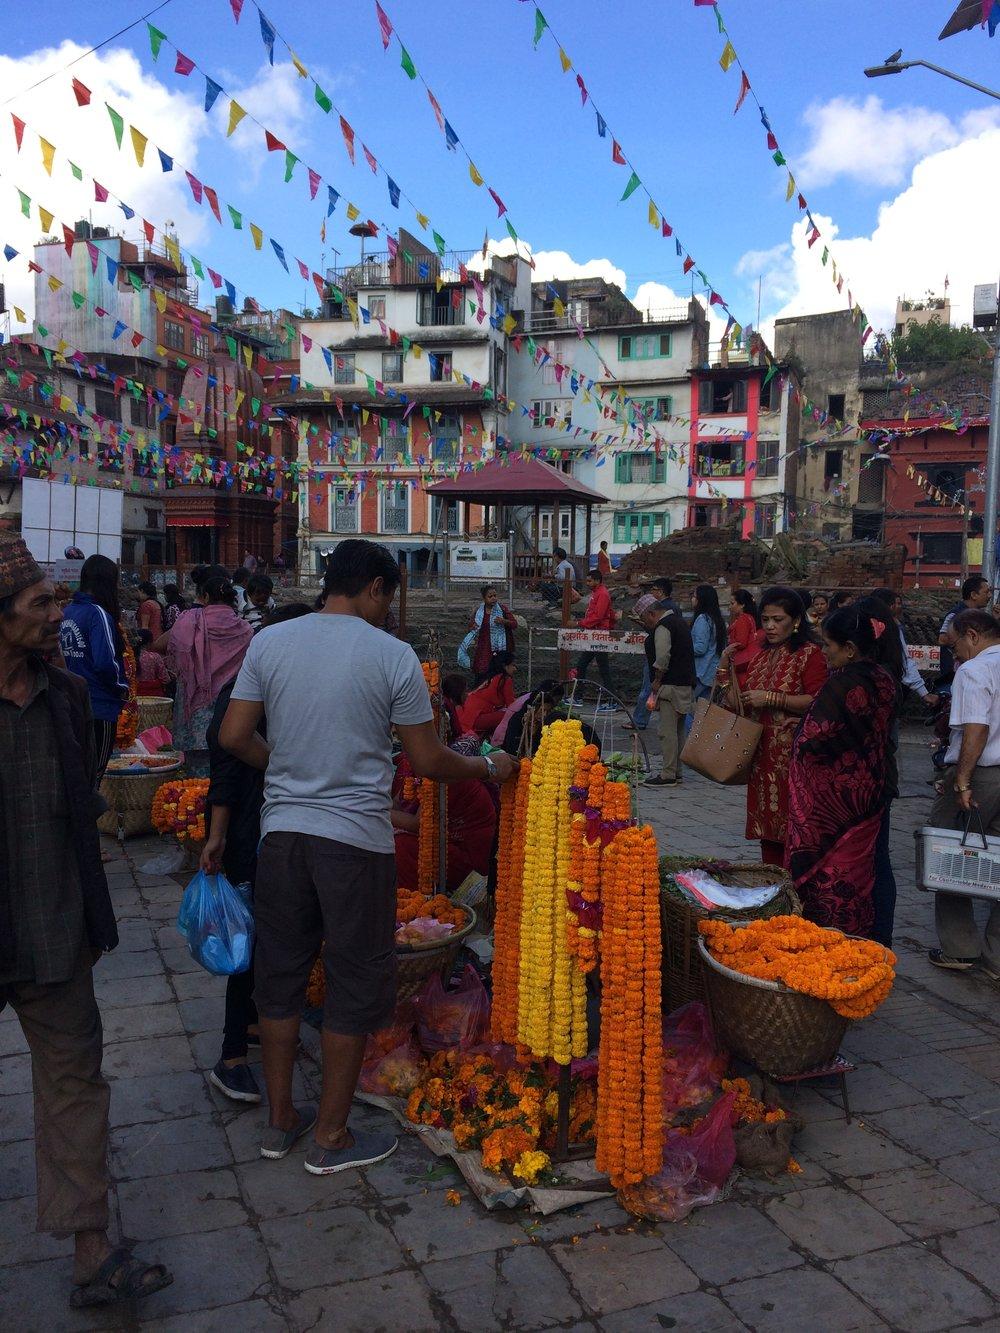 Festivities and marigold necklaces in Kathmandu Durbar Square for Dashain